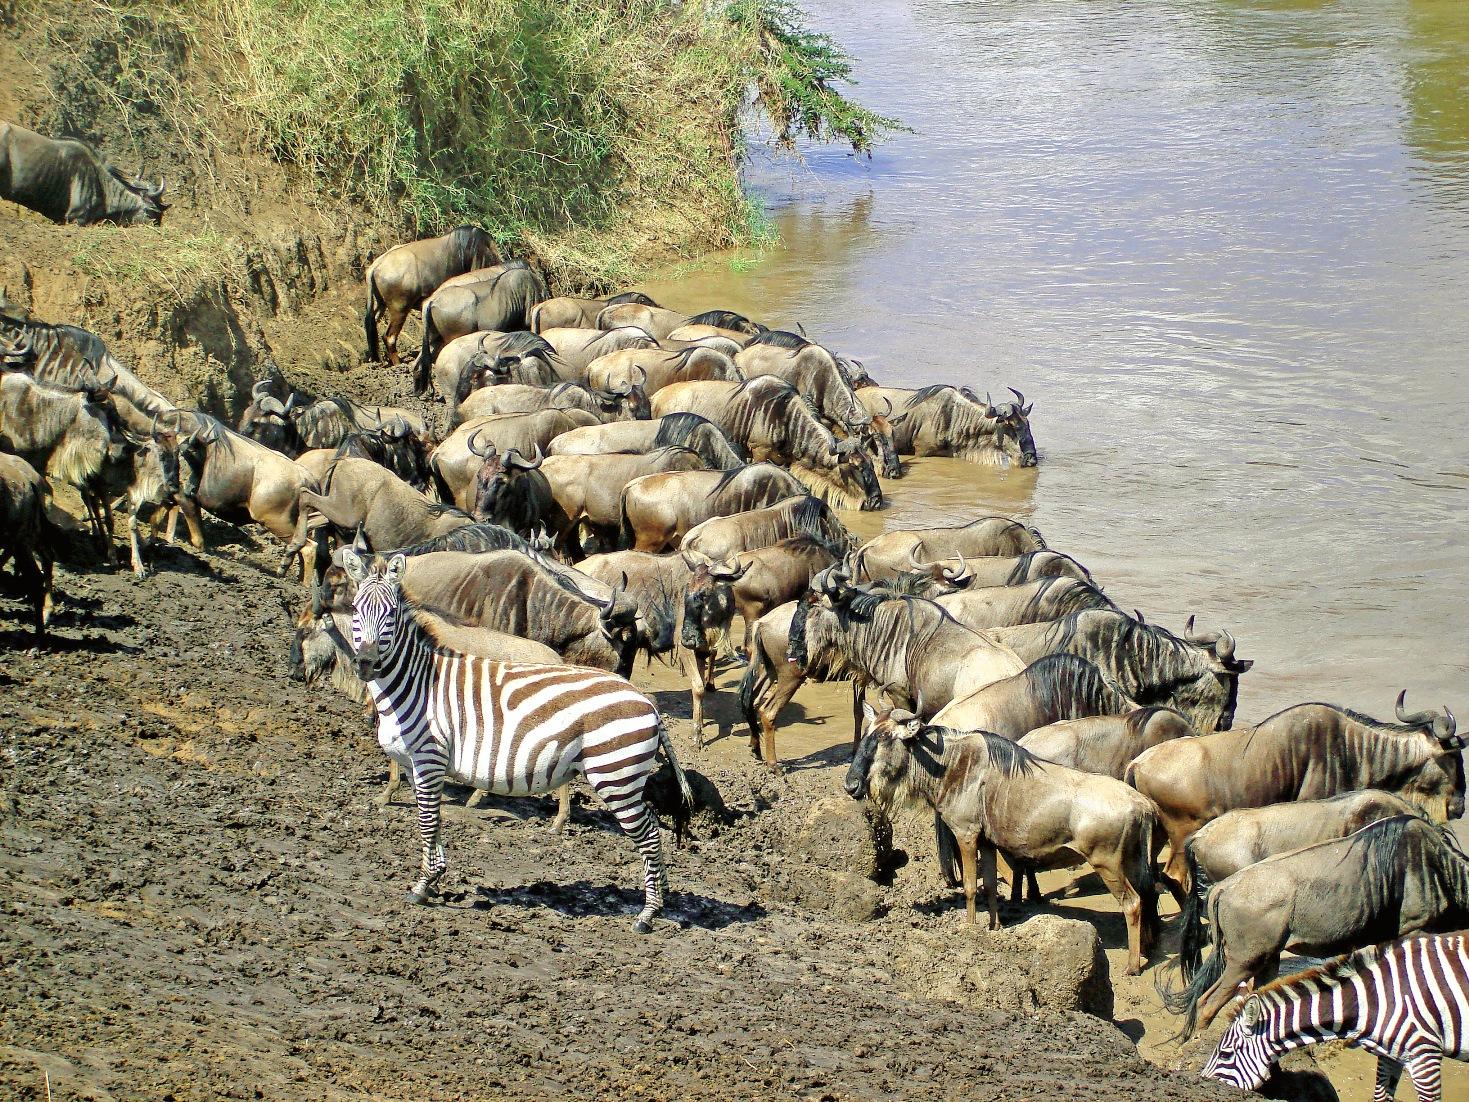 Wildebeests and Zebras along River Mara, source; travel discover Kenya